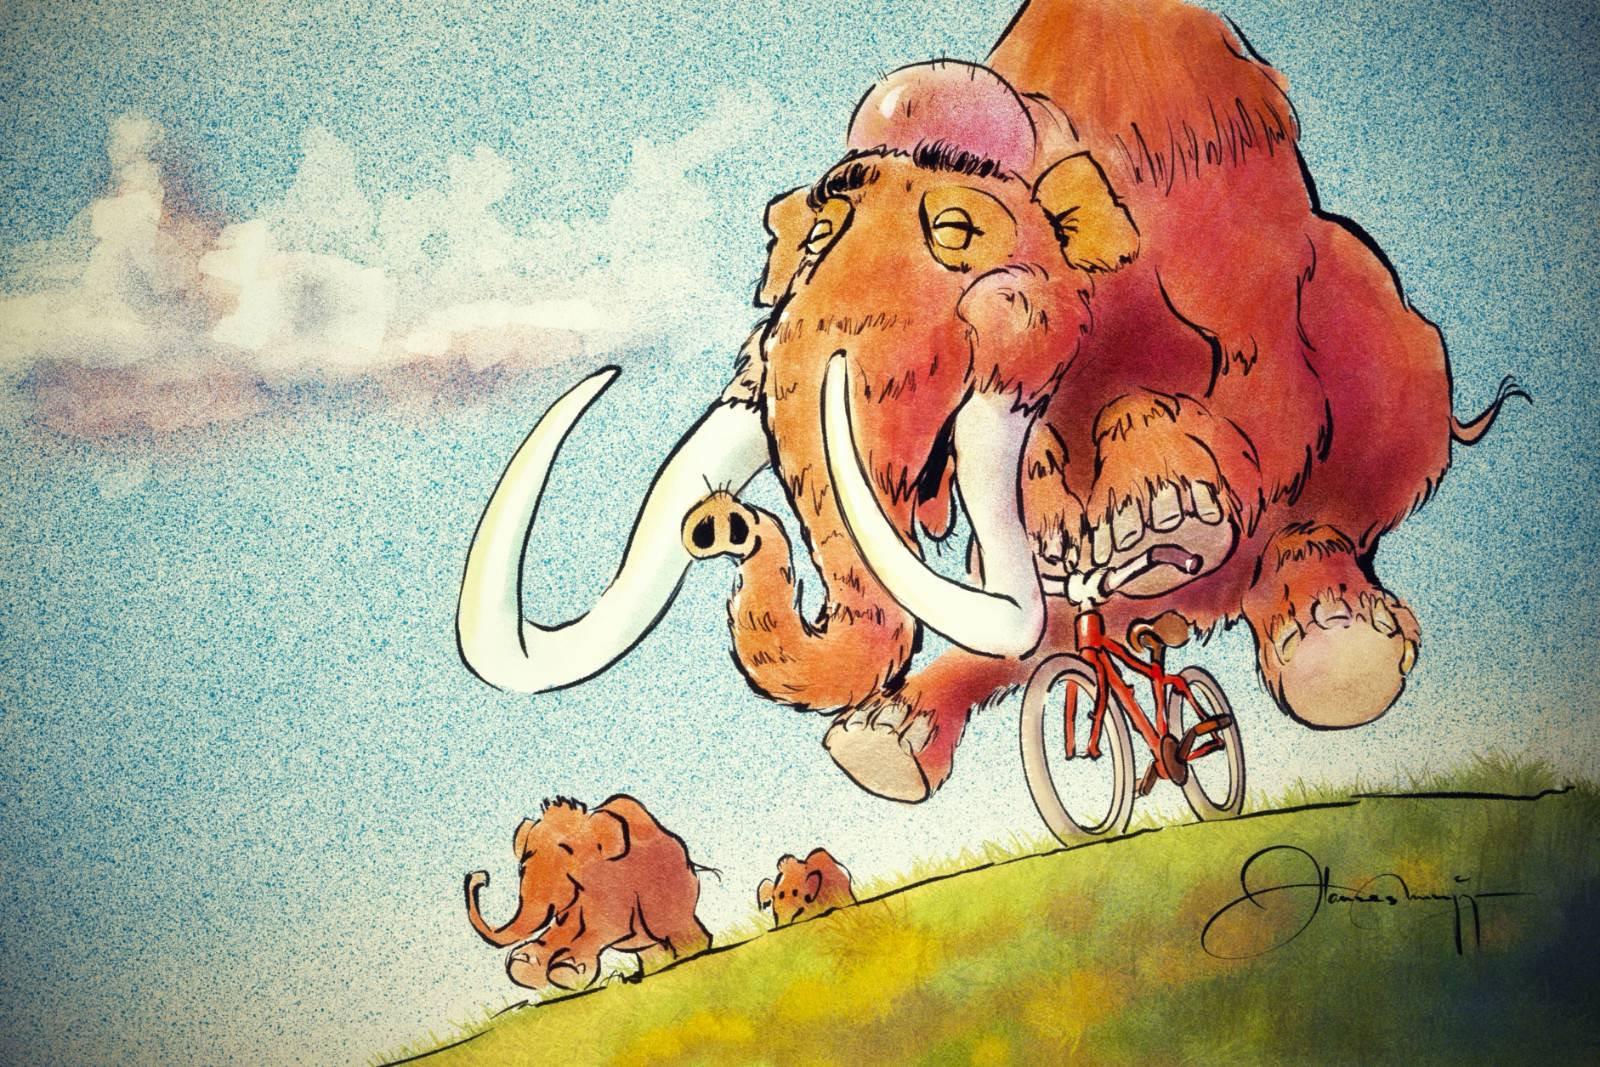 Manfred Mammut fährt Velo, Illustration von Hannes Munzinger